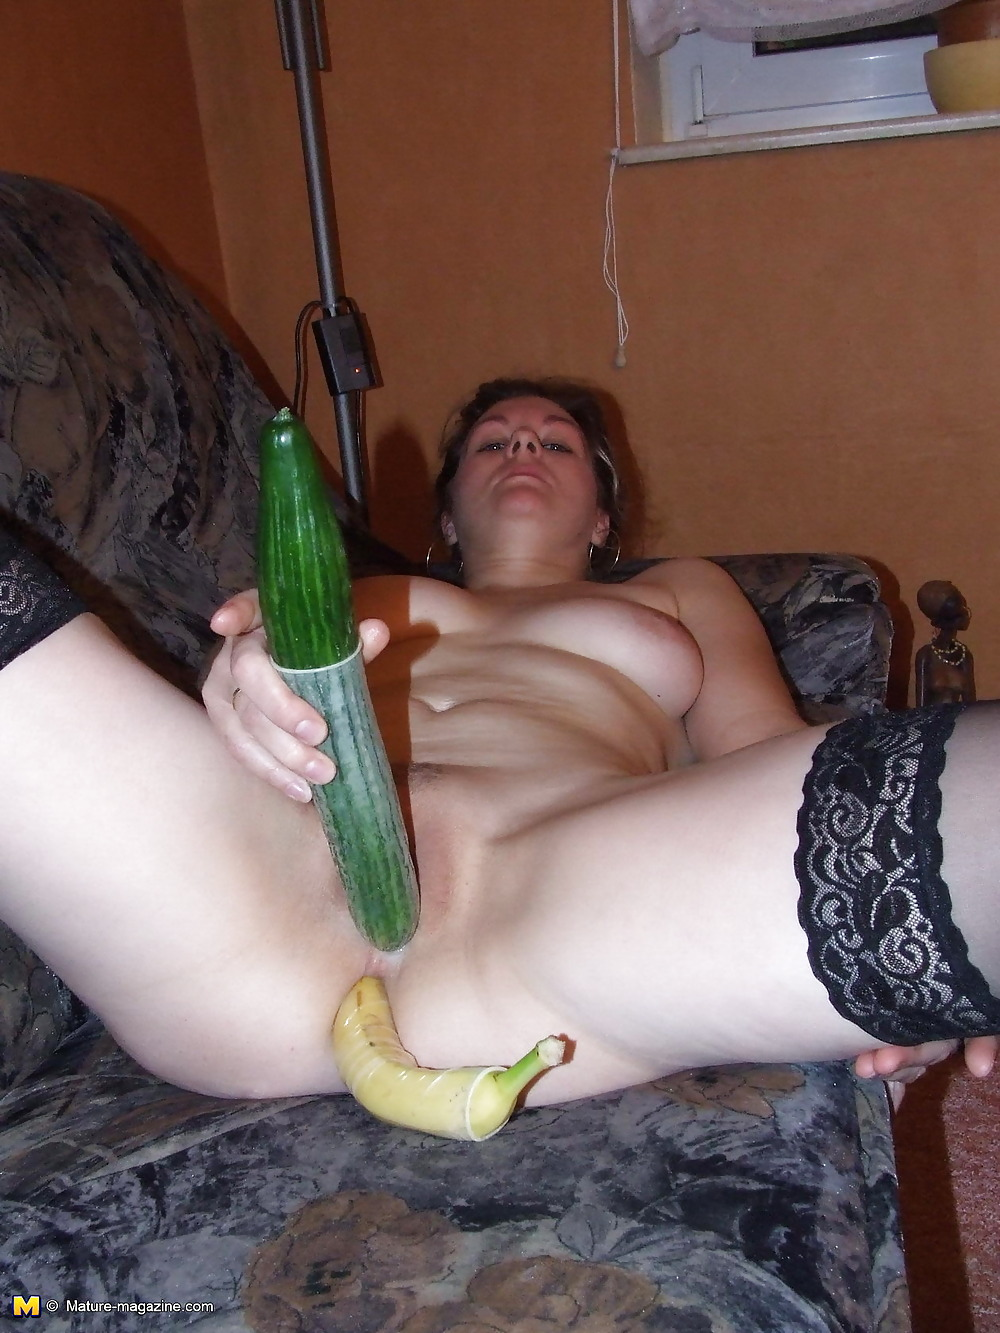 фото тети с бананом в попе частное - 10